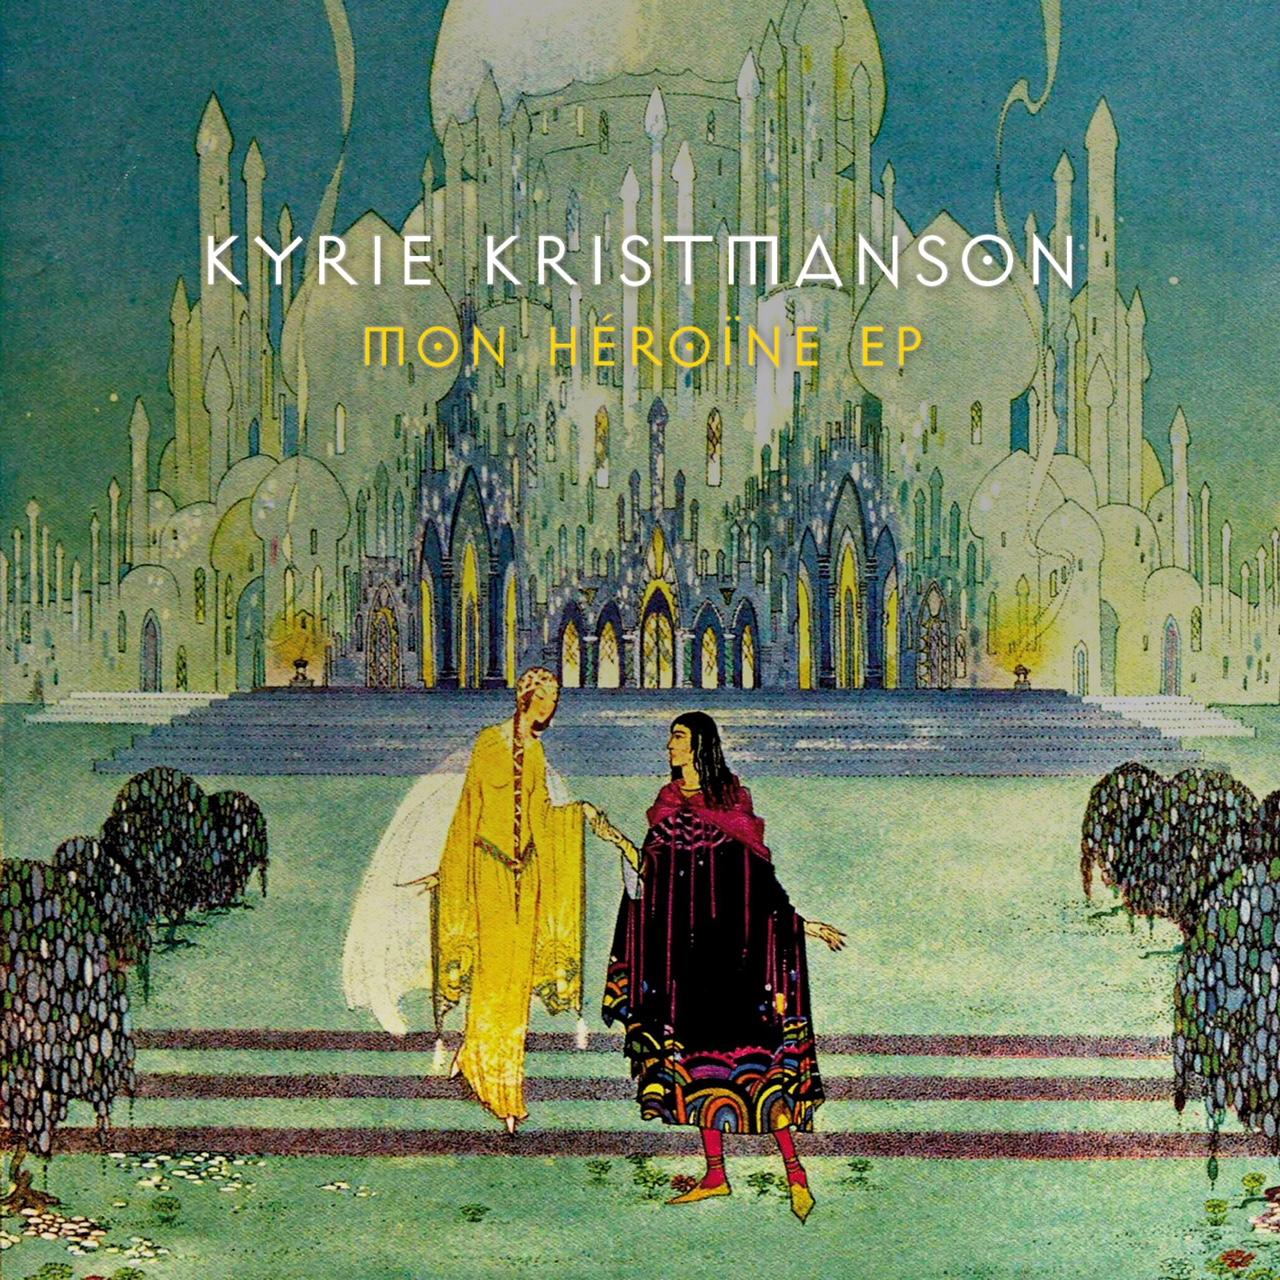 Kyrie Kristmanson